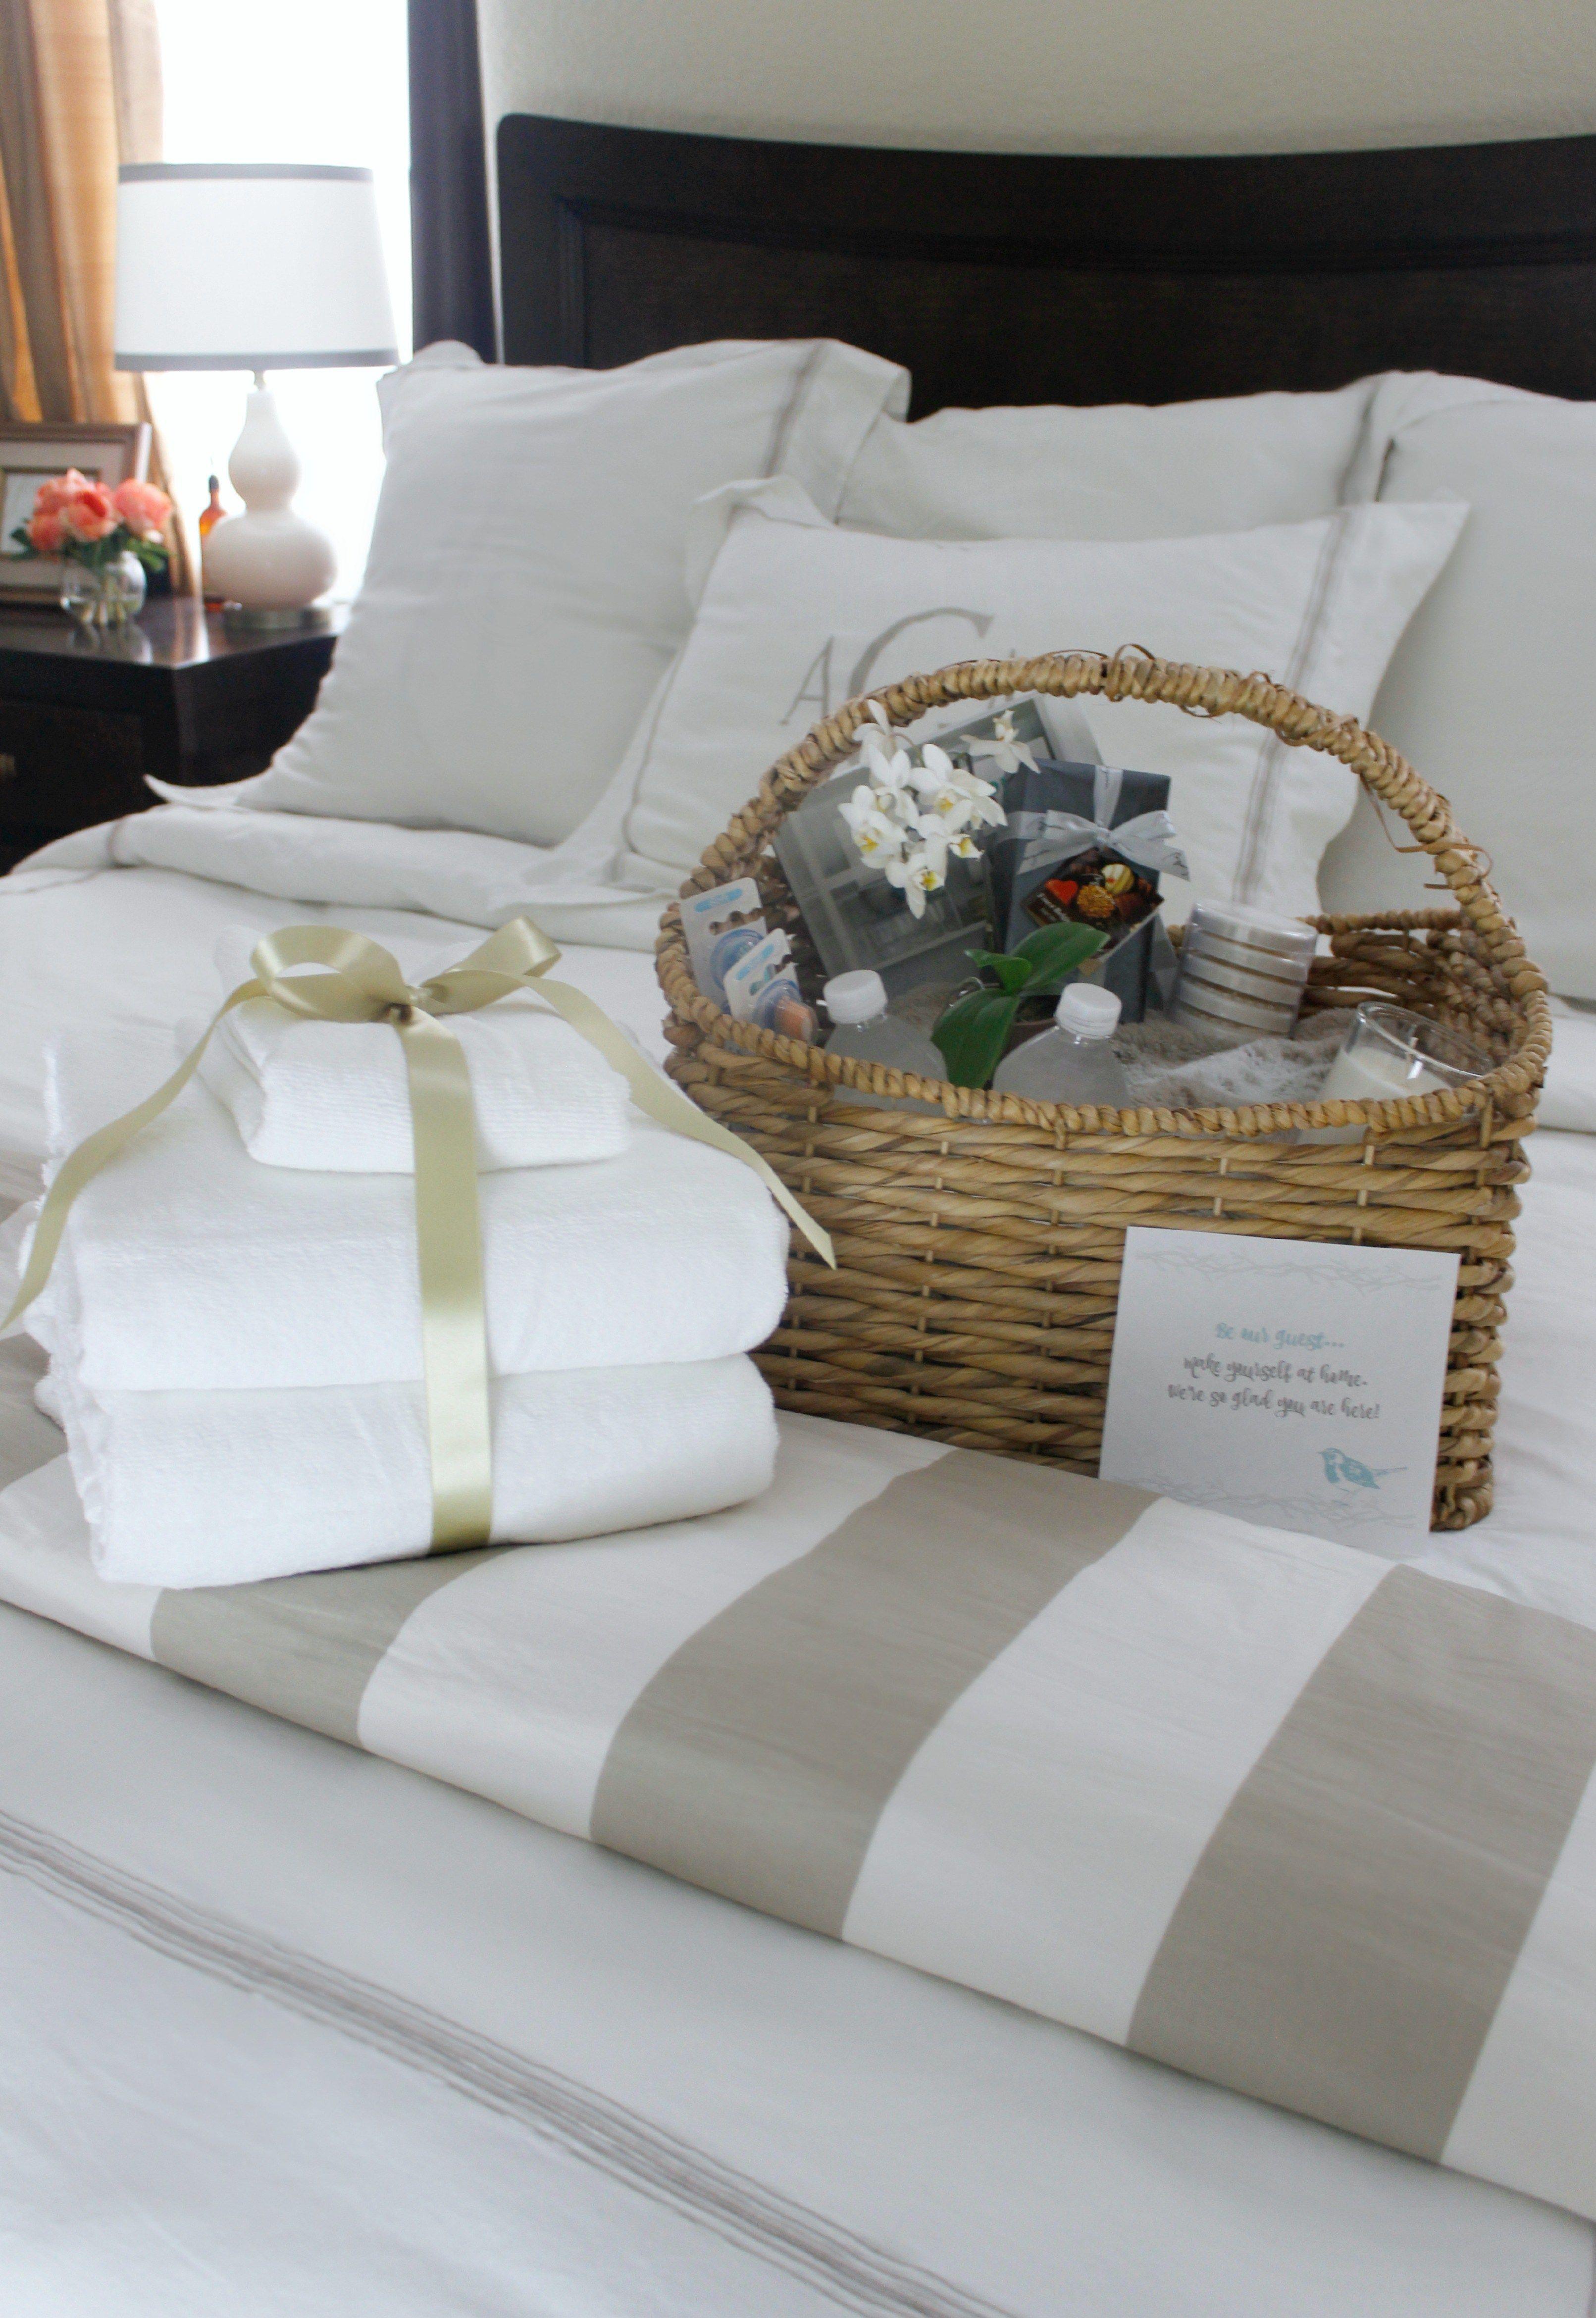 Hotel Guest Room Design: Overnight Guest Welcome Basket …